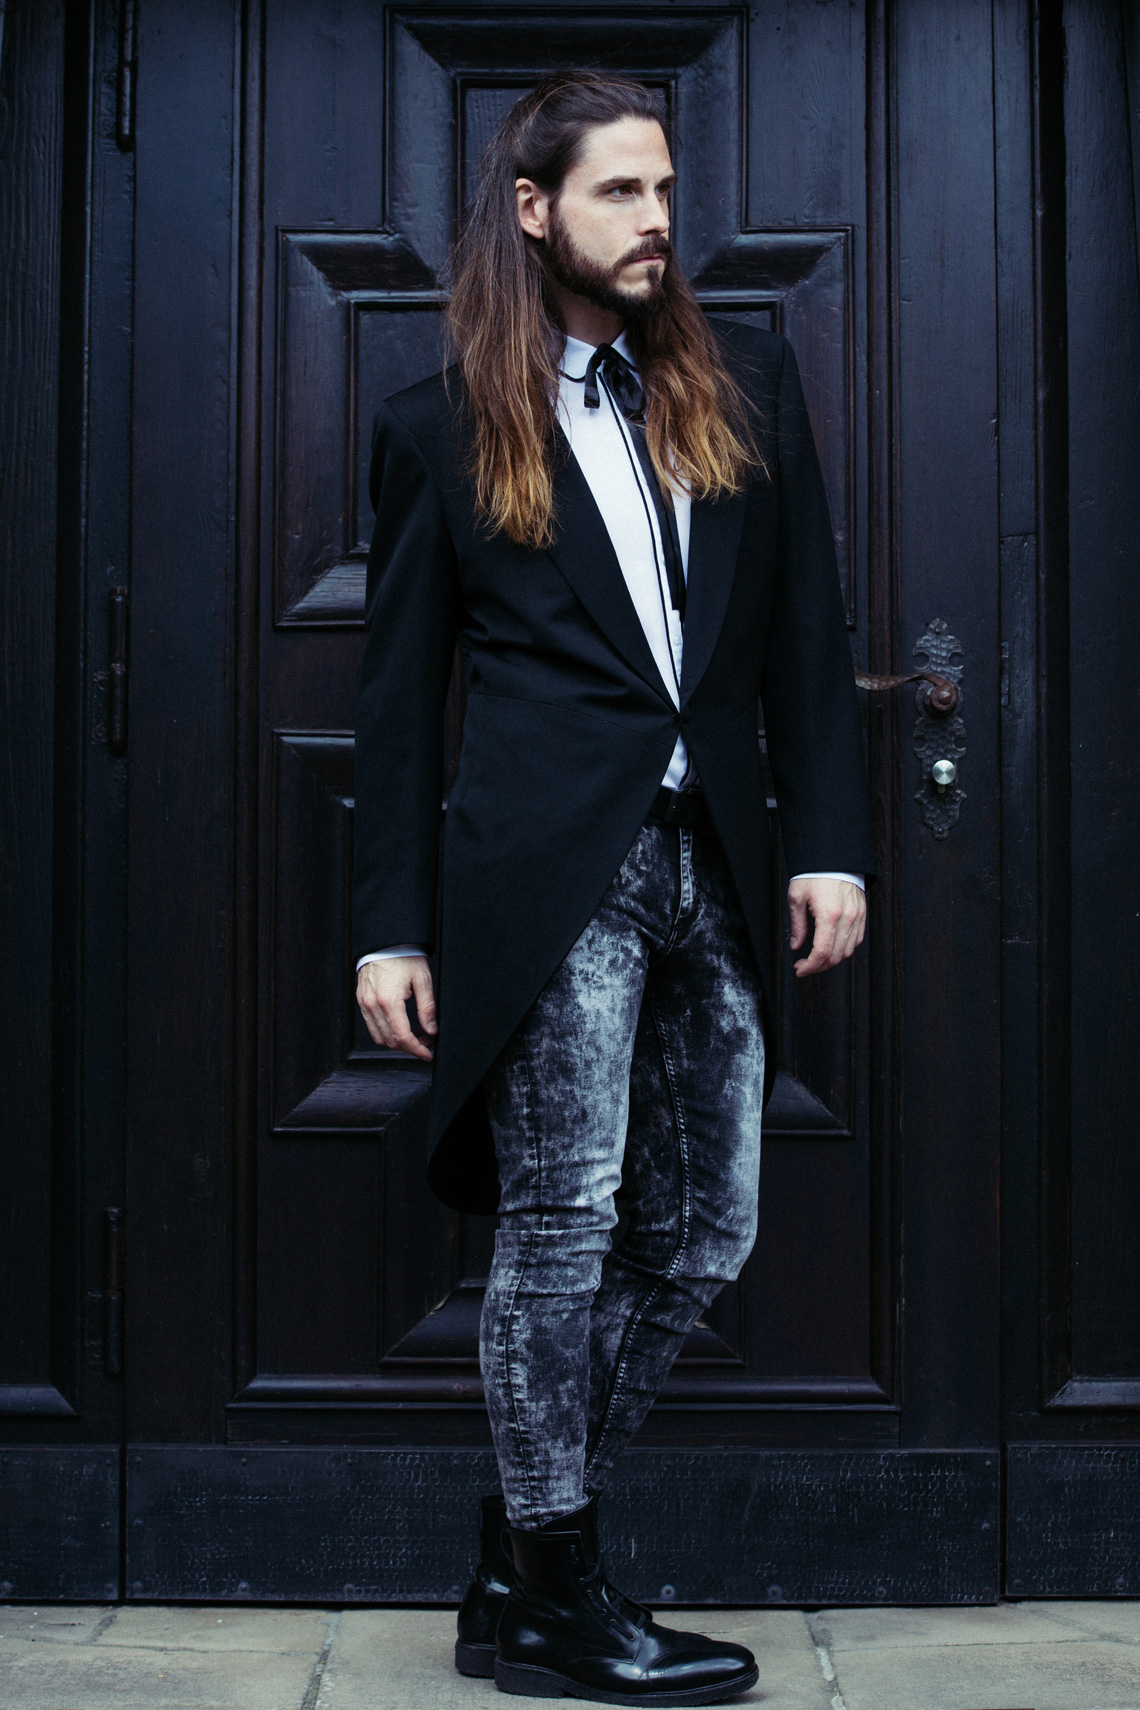 outfit luxus frack mit jeans kombiniert kaisers neue kleider. Black Bedroom Furniture Sets. Home Design Ideas